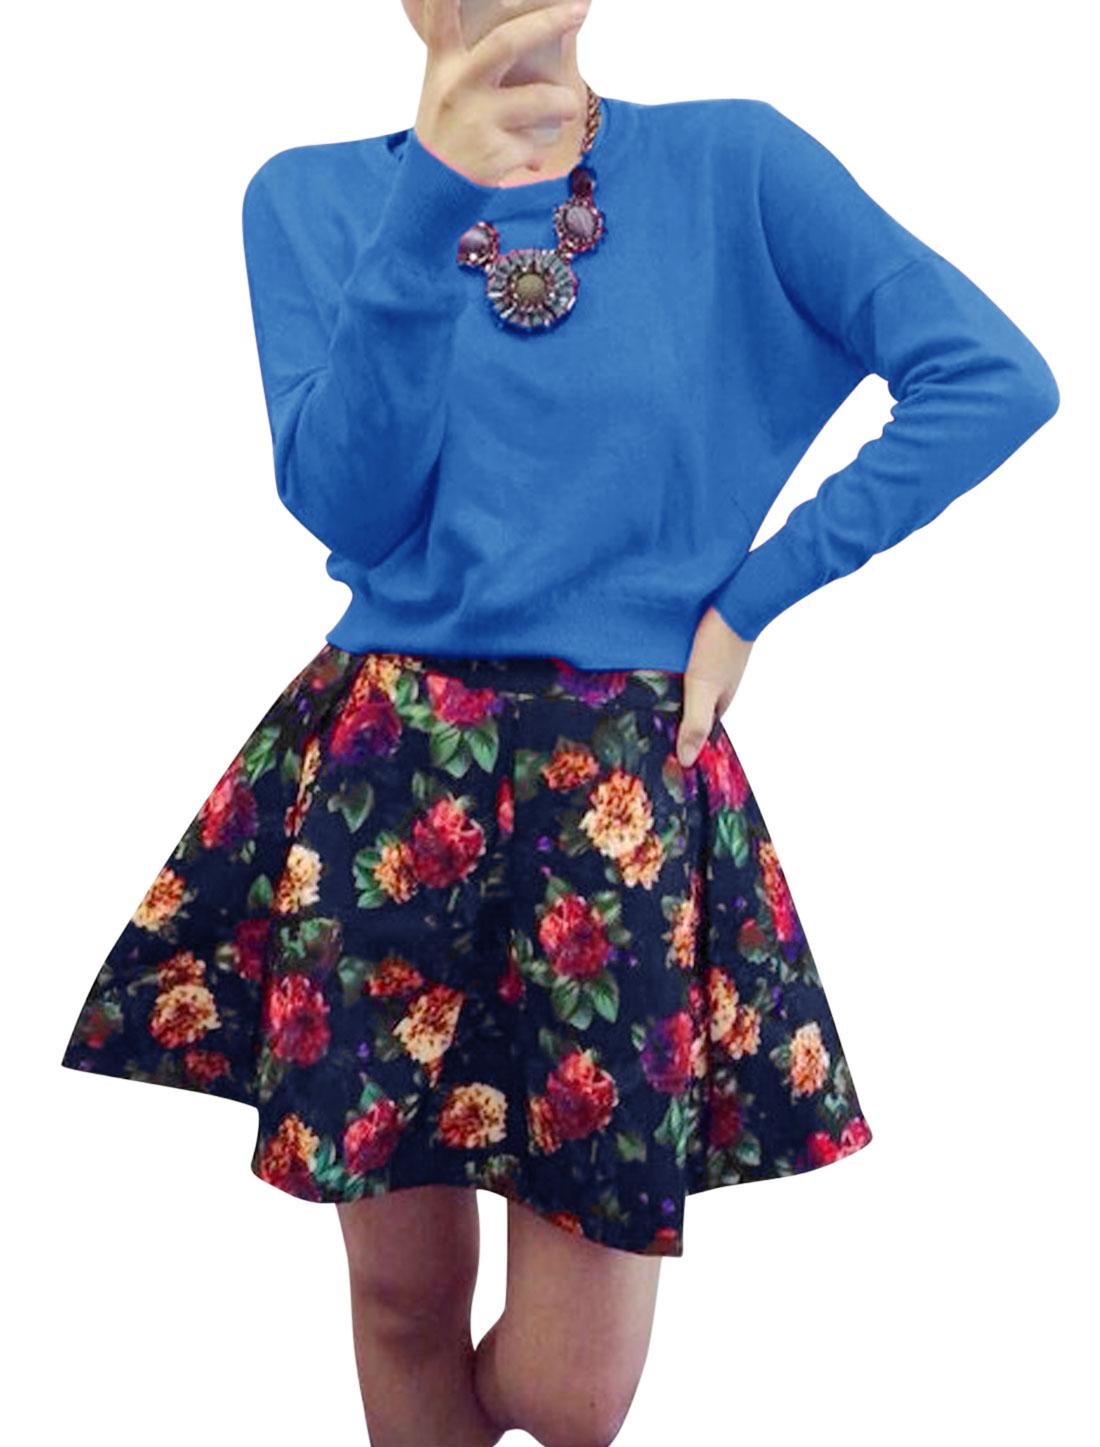 Ladies Blue Round Neck Slipover Top w Flower Prints Mid Rise Skirt Set XS